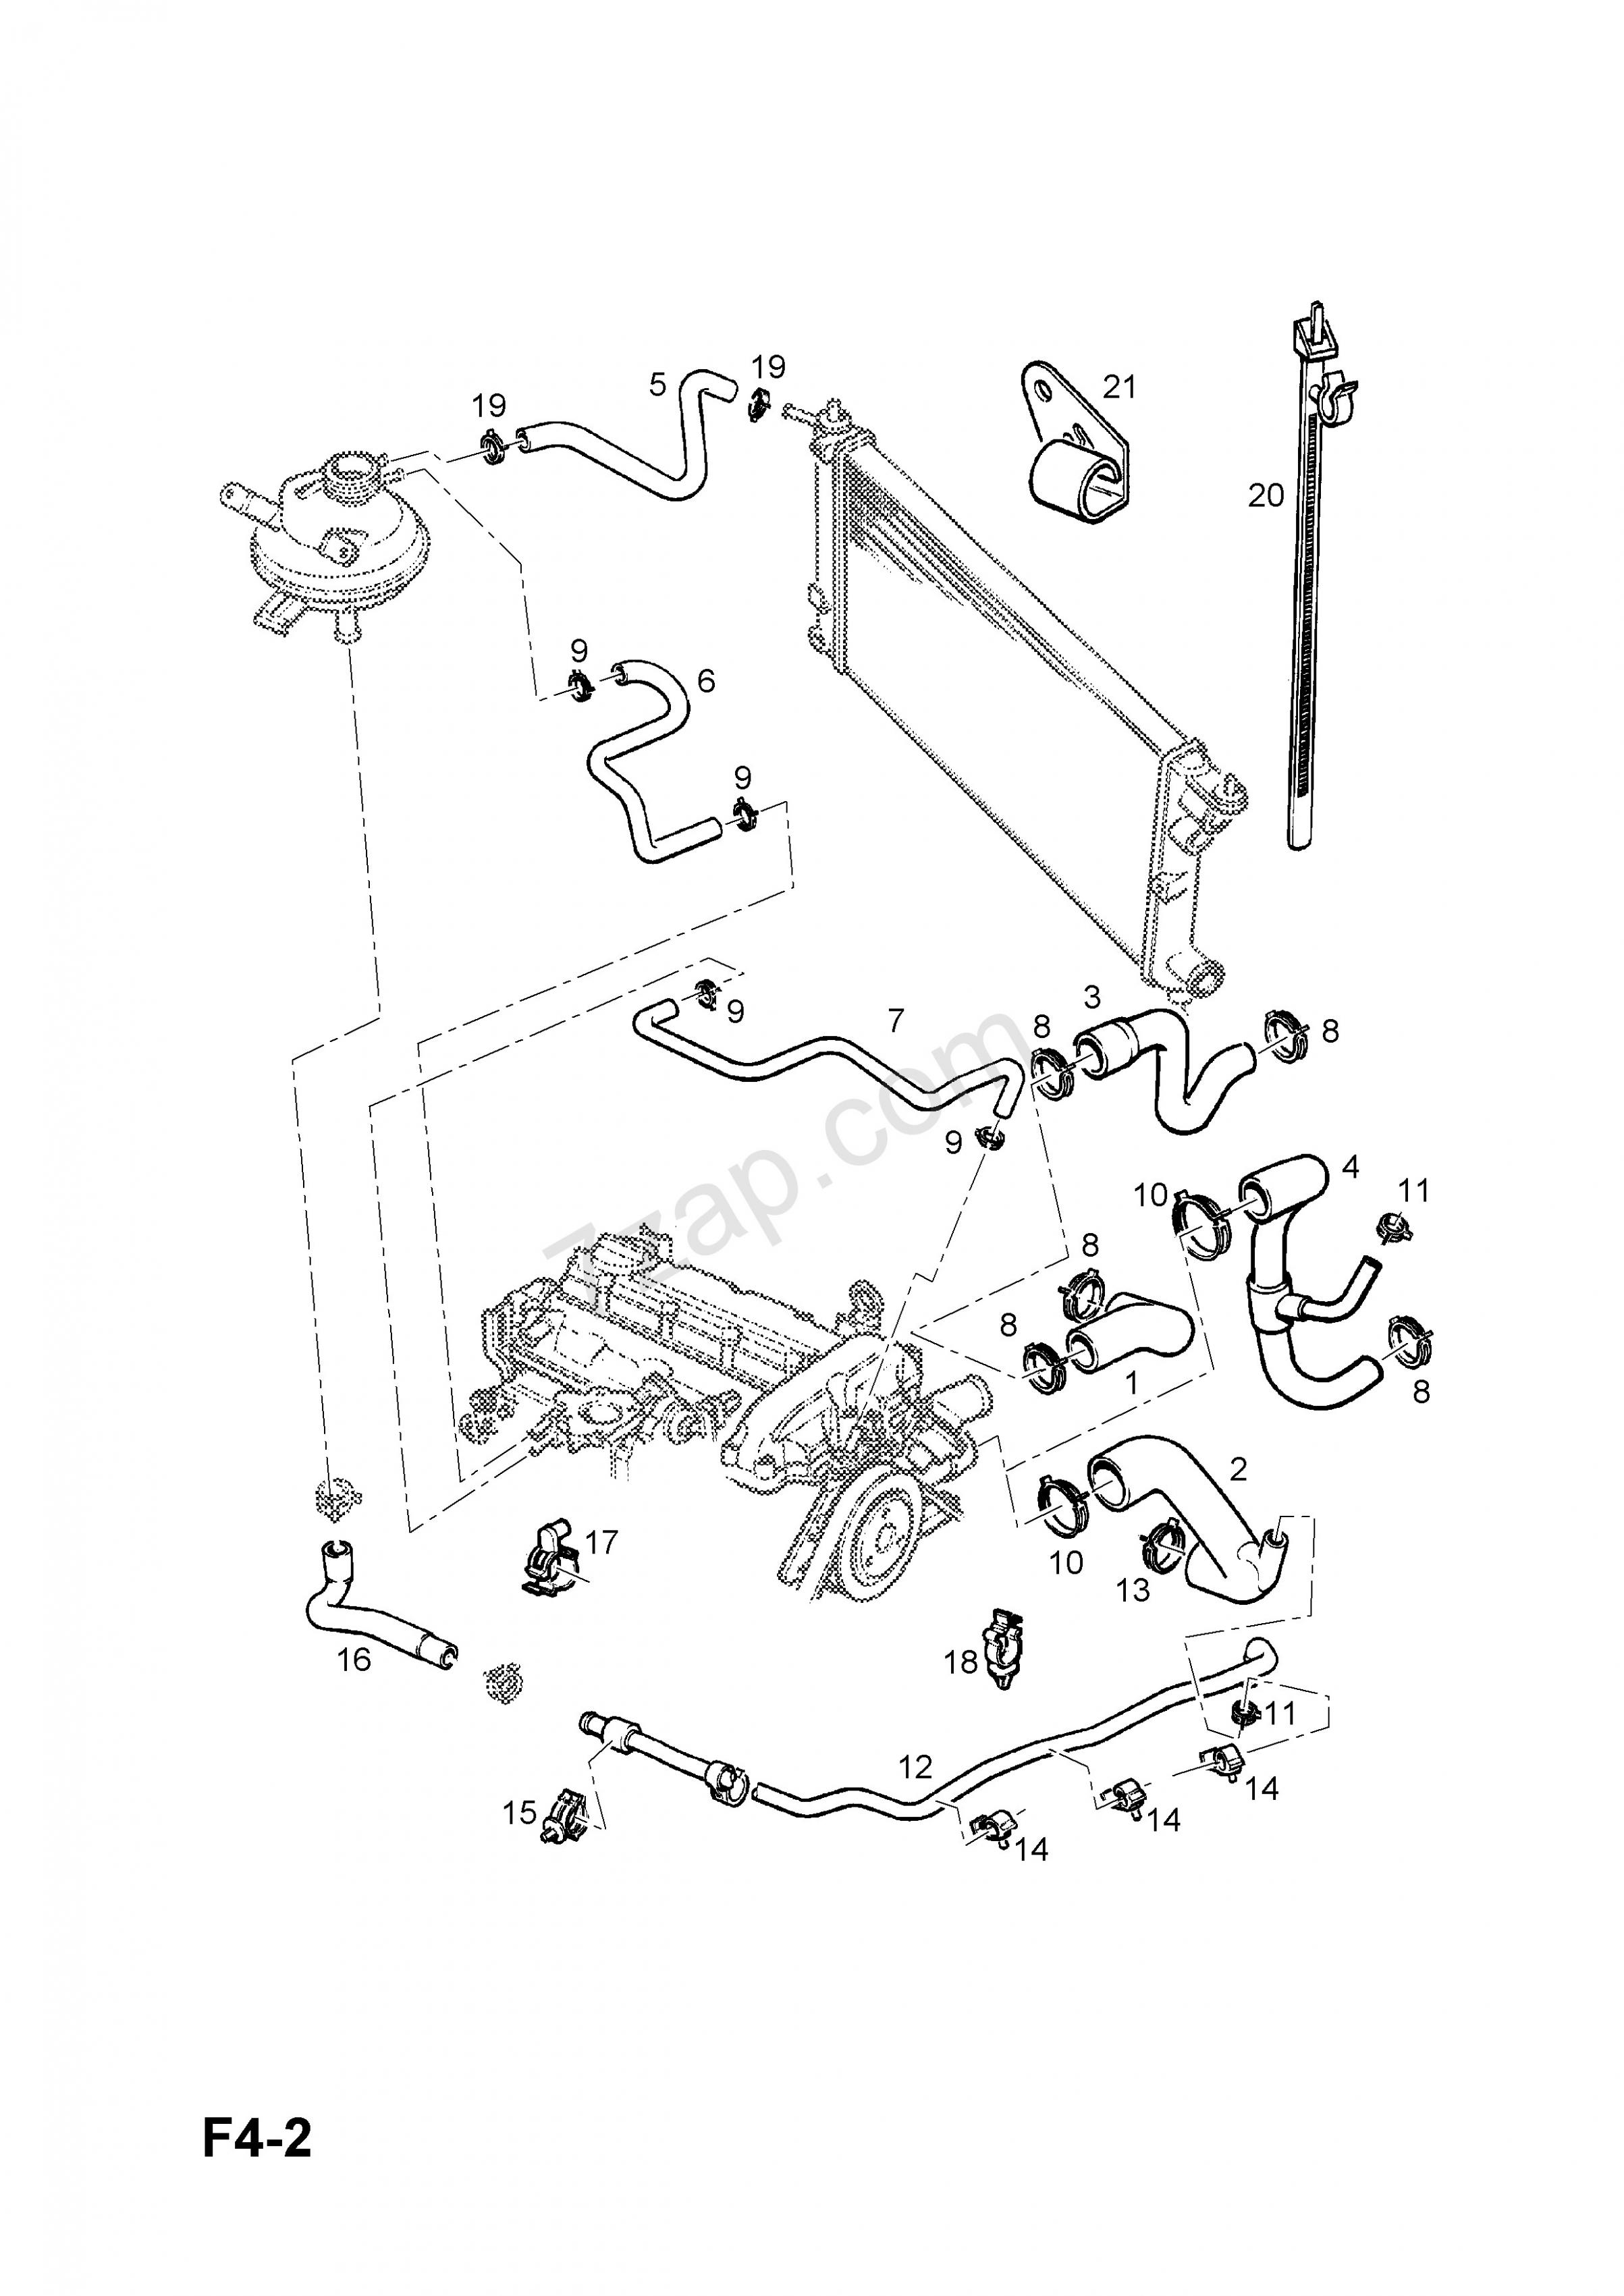 Z9dth Engine Diagram Book Di